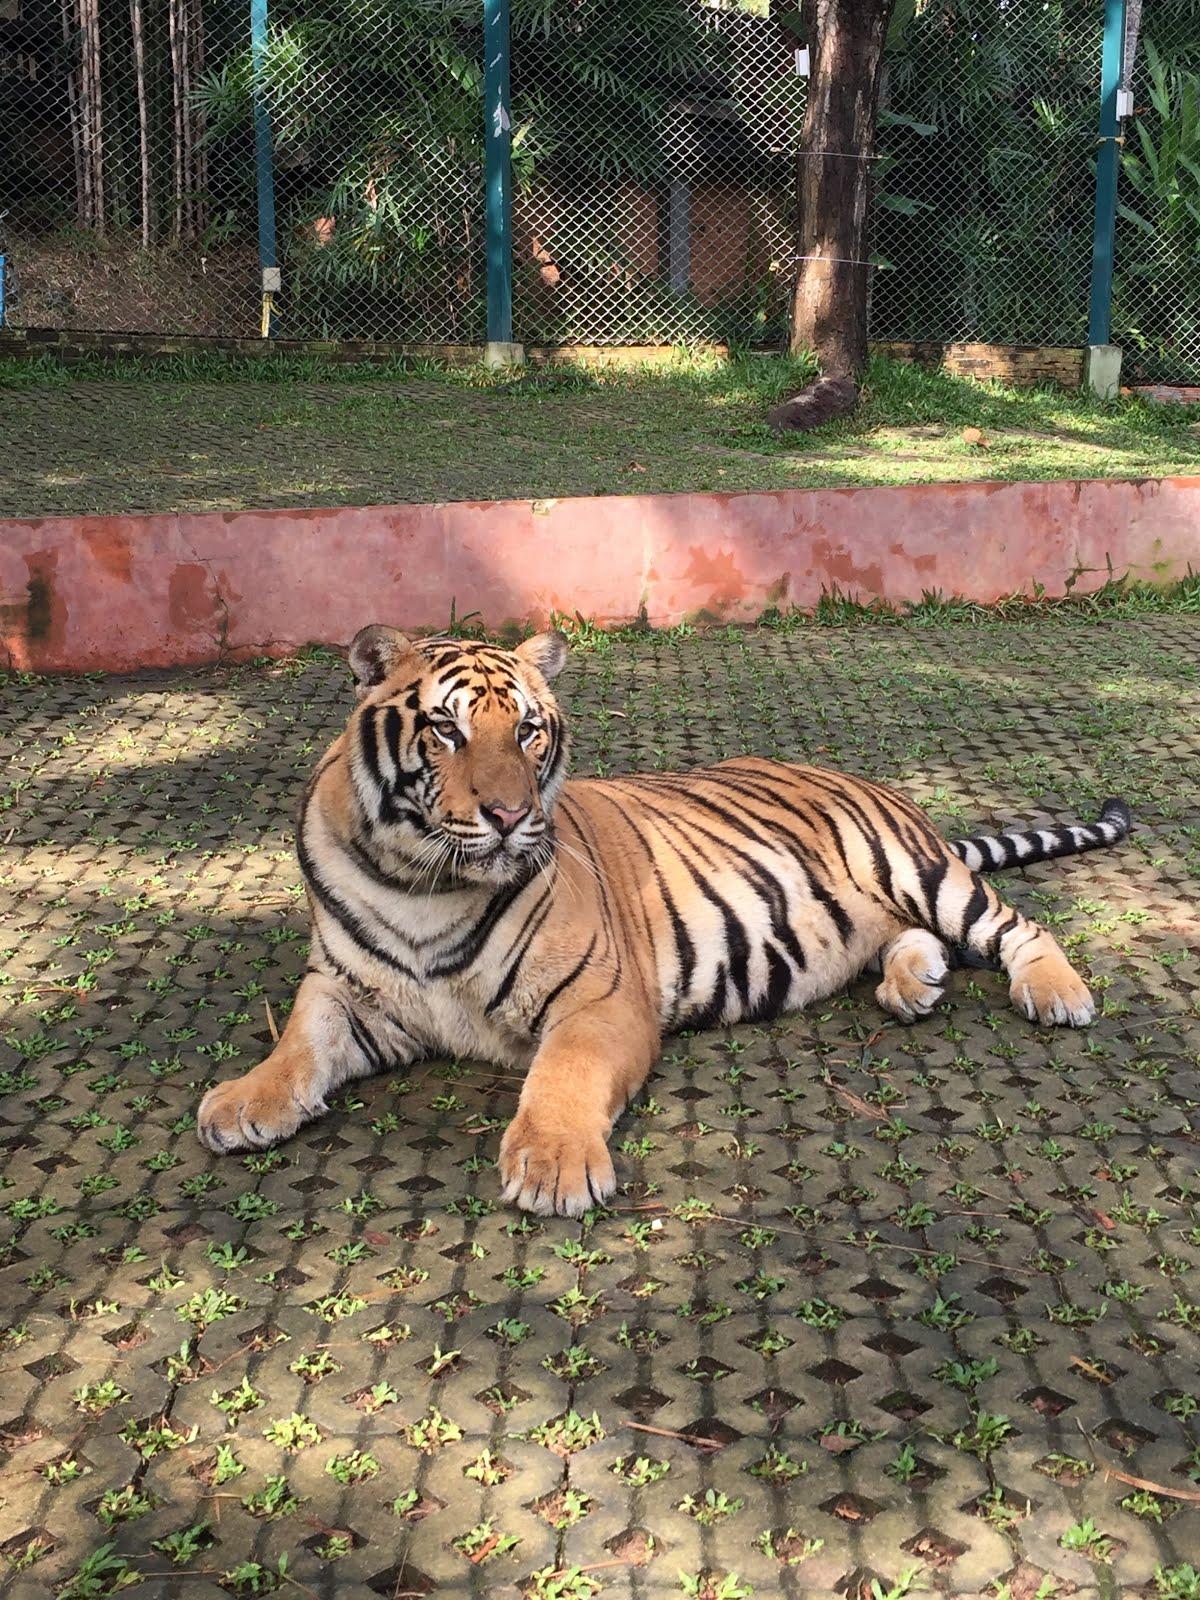 Tiger Kingdom in Chiang Mai, Thailand